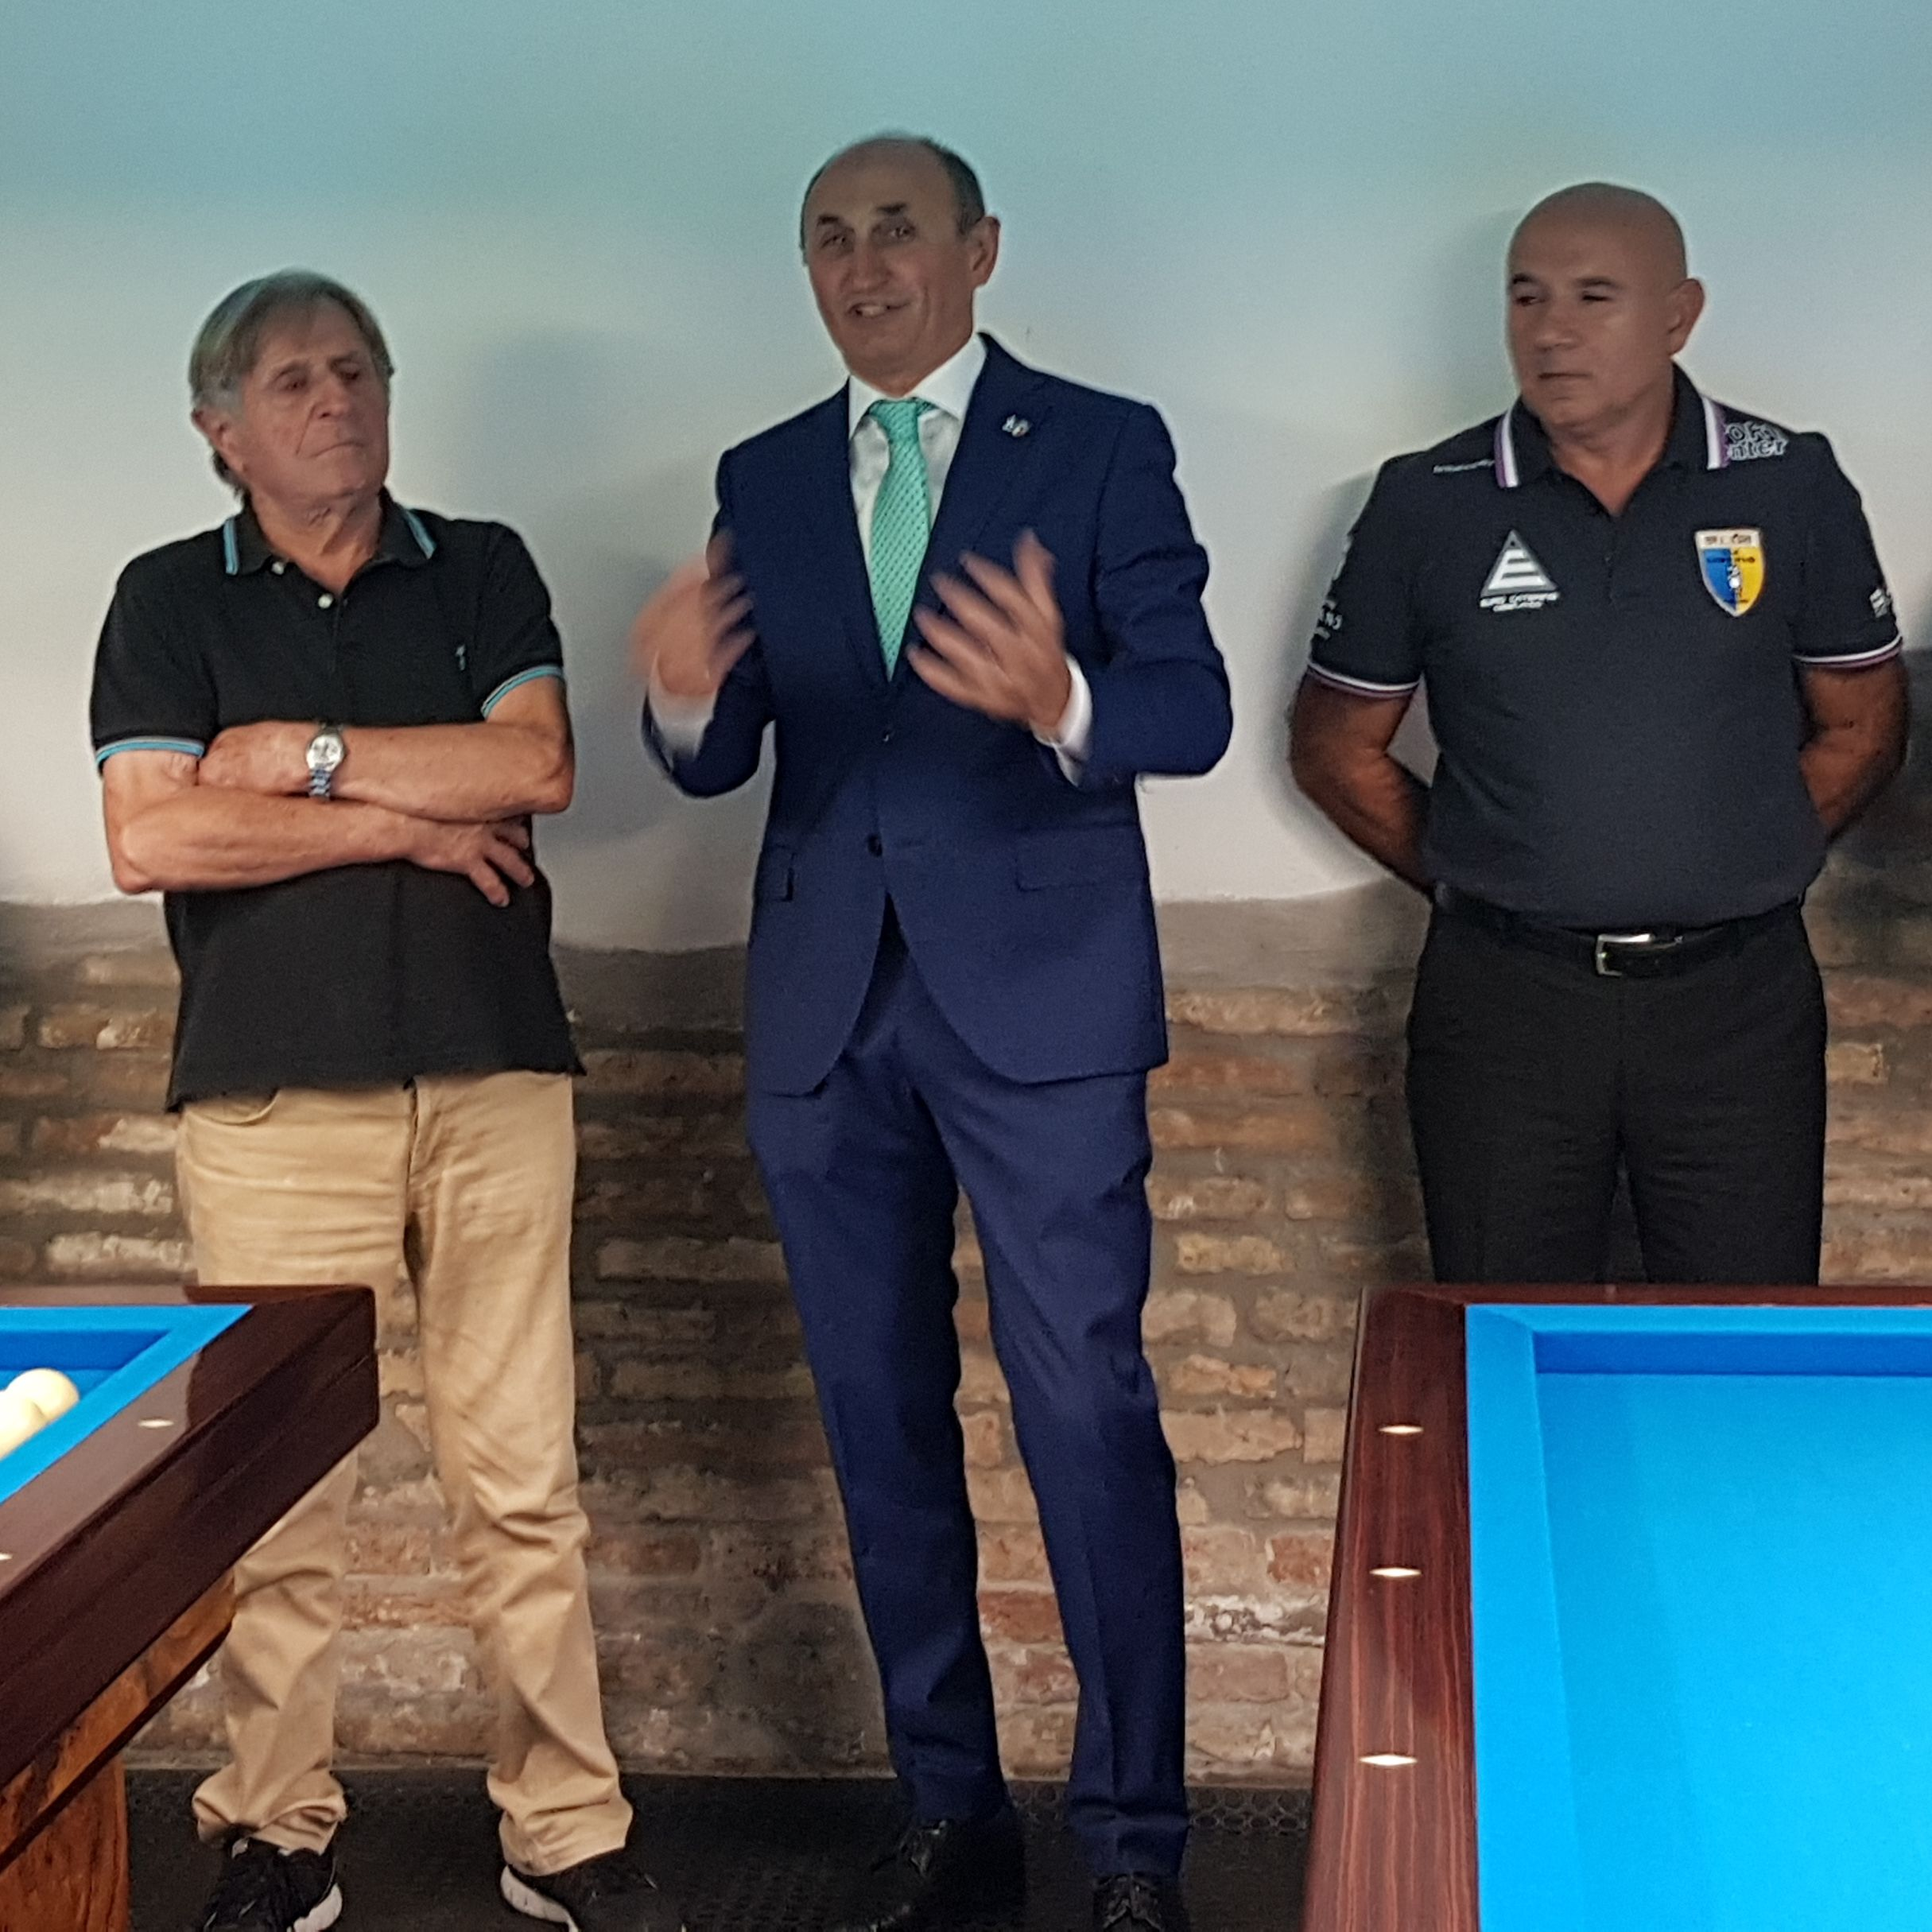 LIBERIO De Lorenzi, Loris De Cesari  e Valerio Bersani